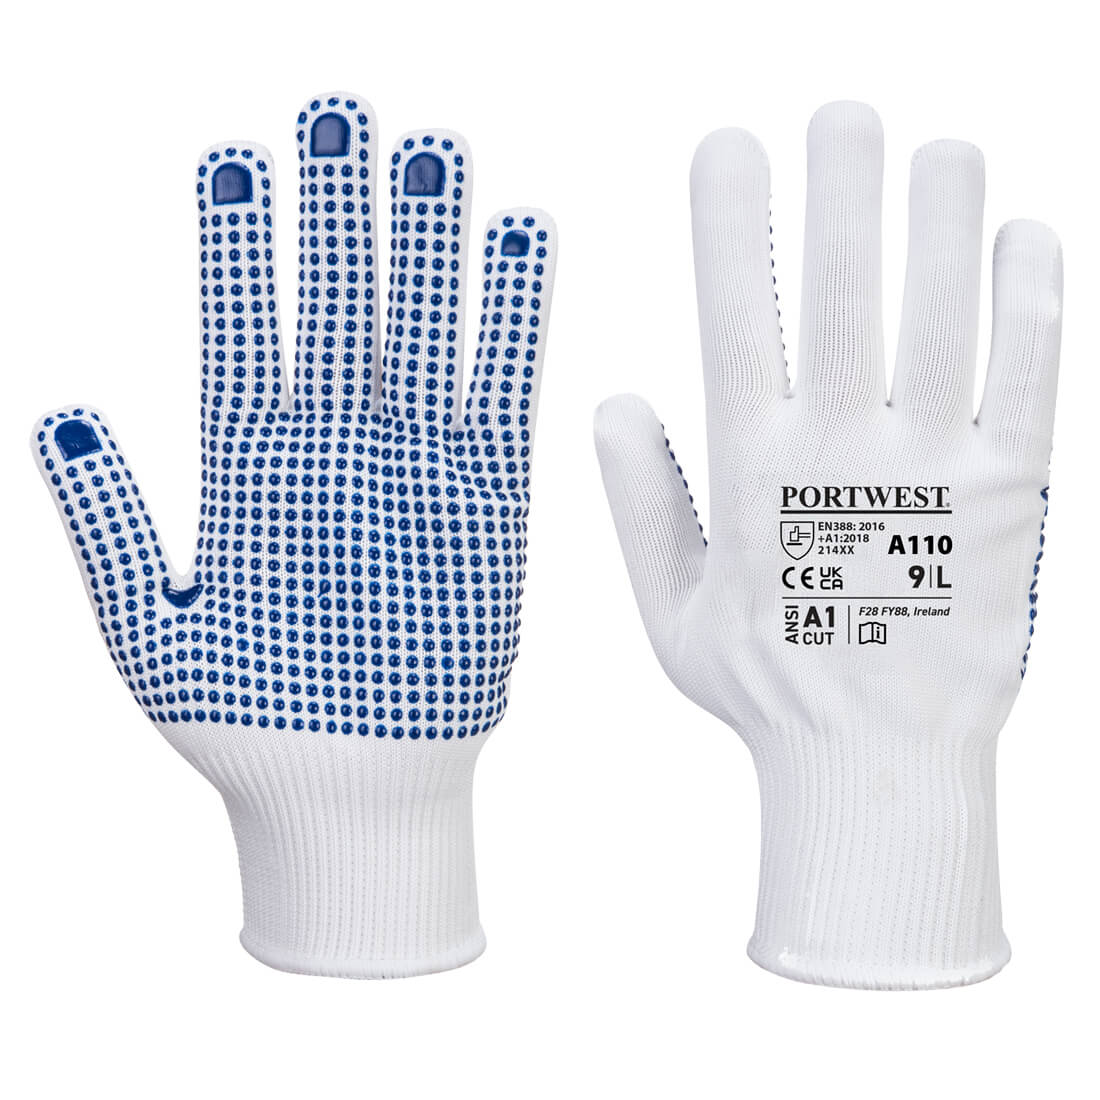 Polka Dot Glove, WhBlu     Size Large R/Fit